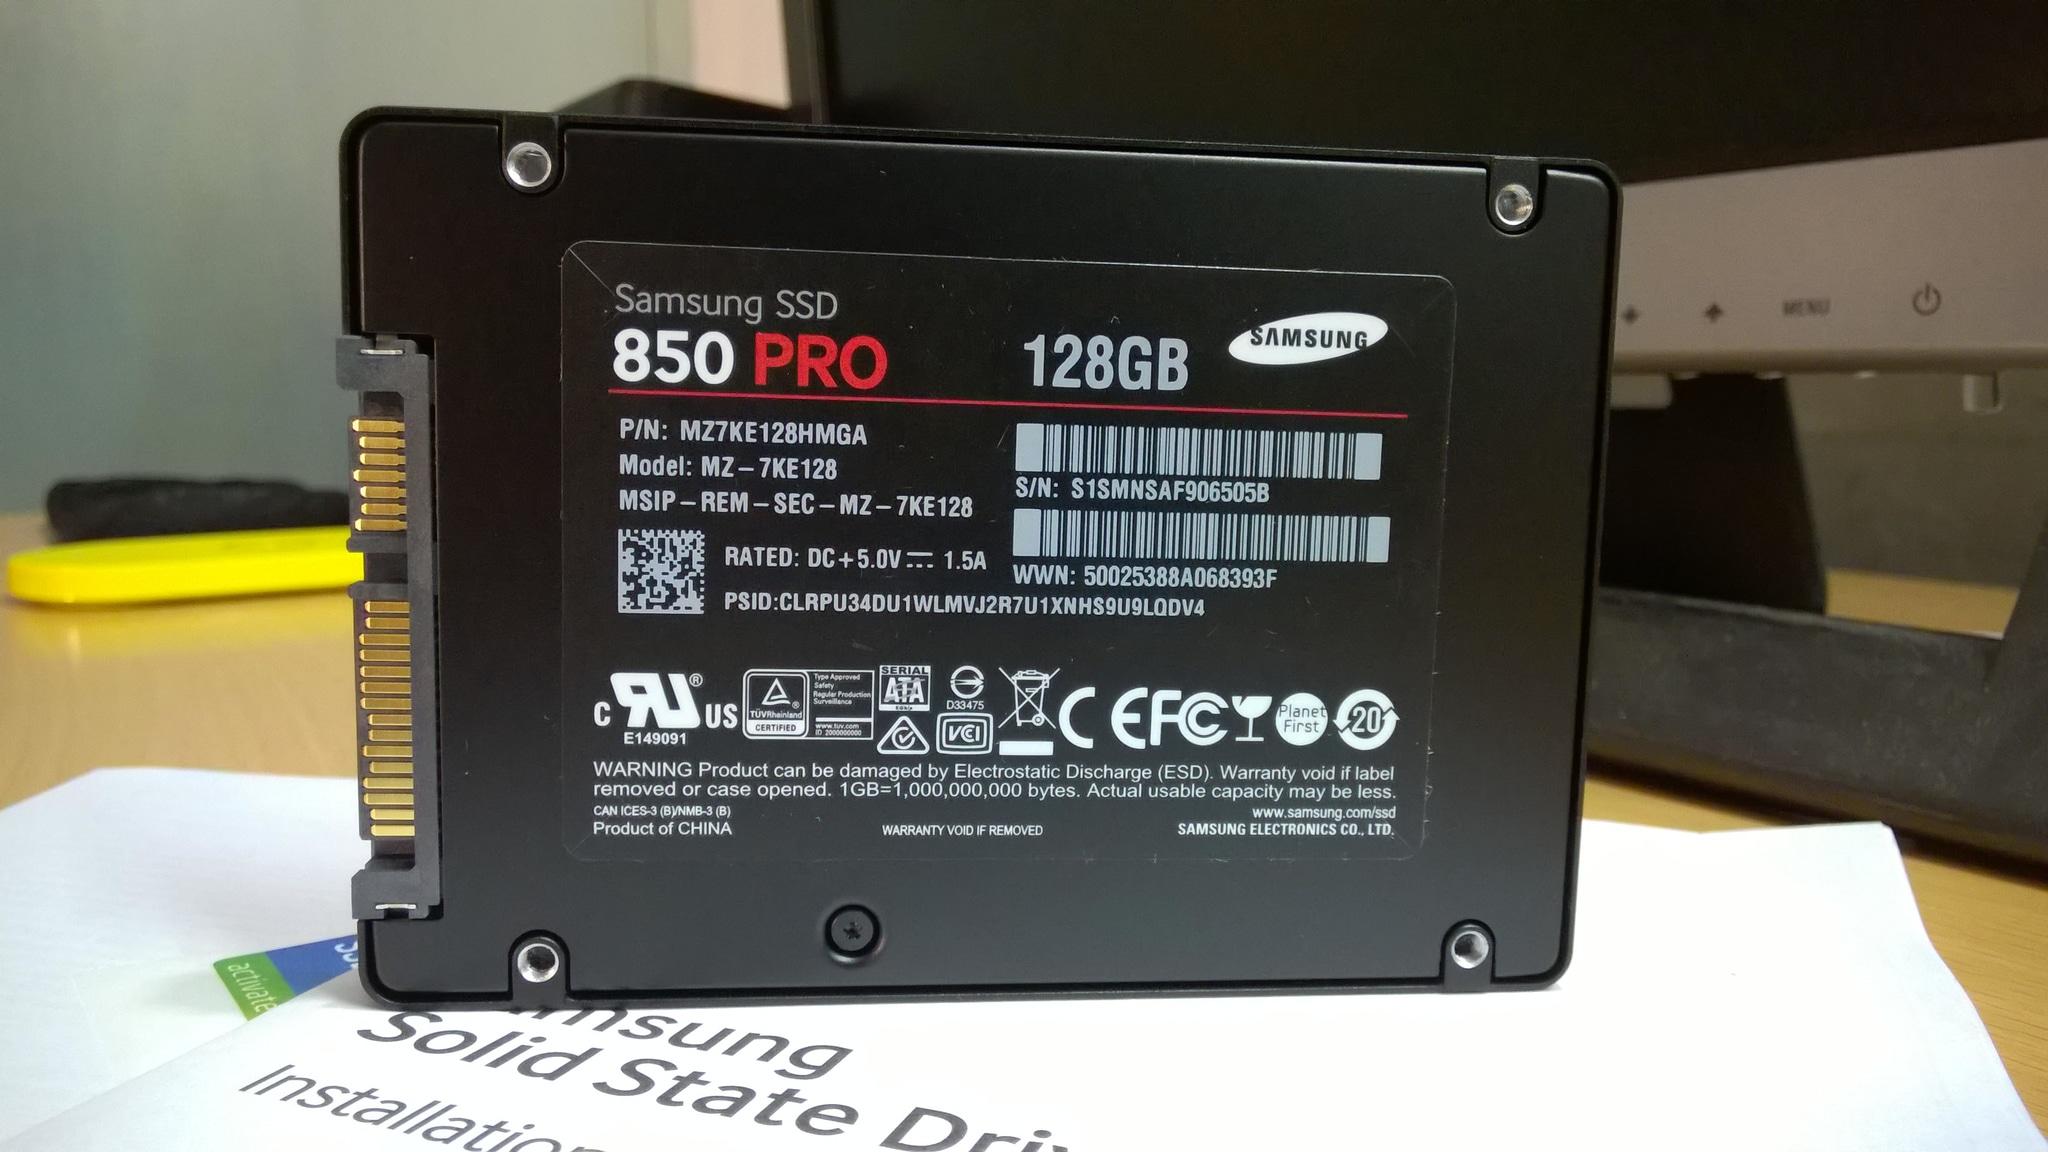 SSD SAMSUNG 2.5' 850 PRO 128GB